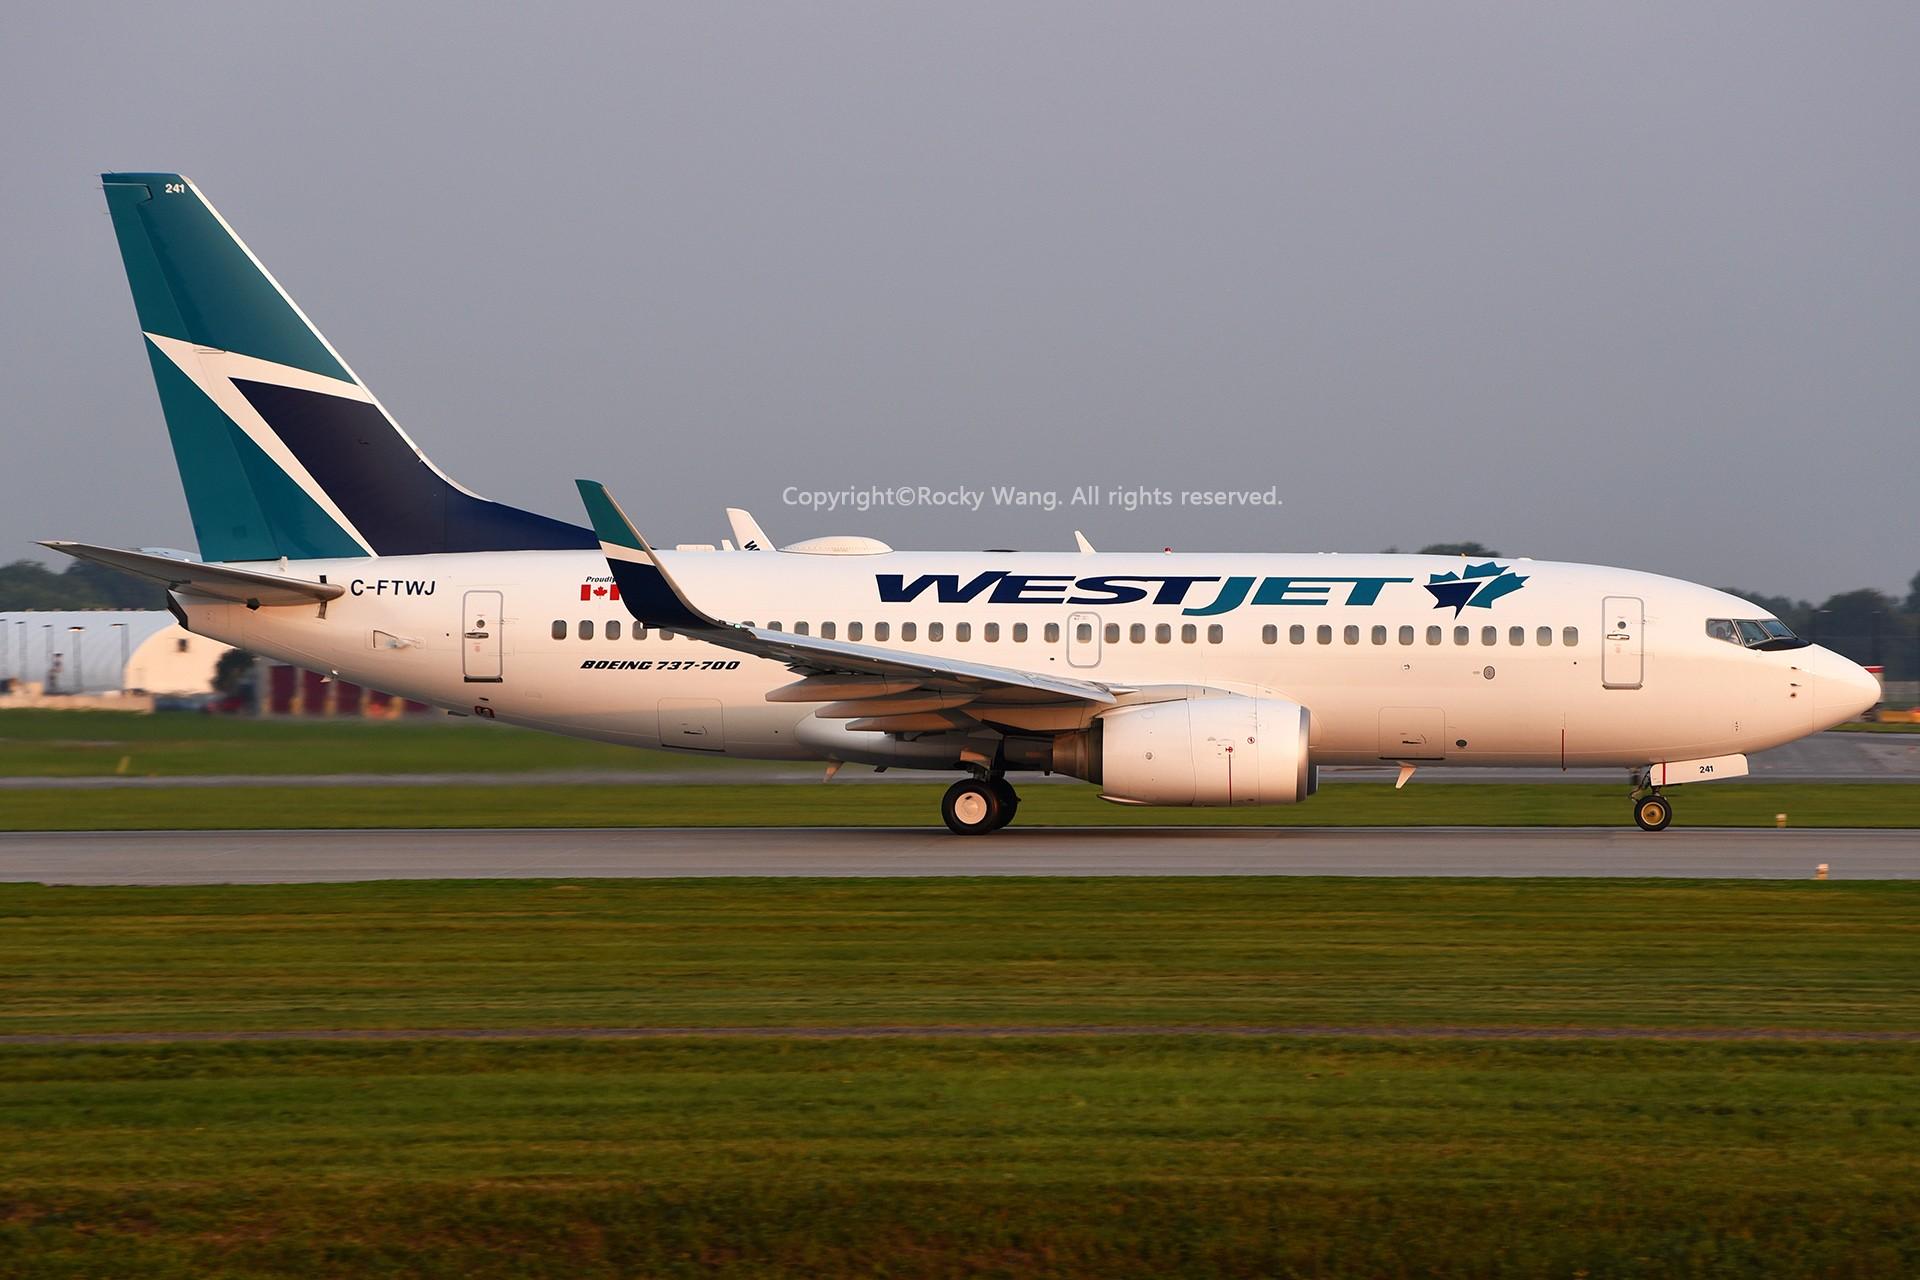 Re:[原创]窄体连连看 BOEING 737-7CT C-FTWJ 加拿大蒙特利尔特鲁多机场